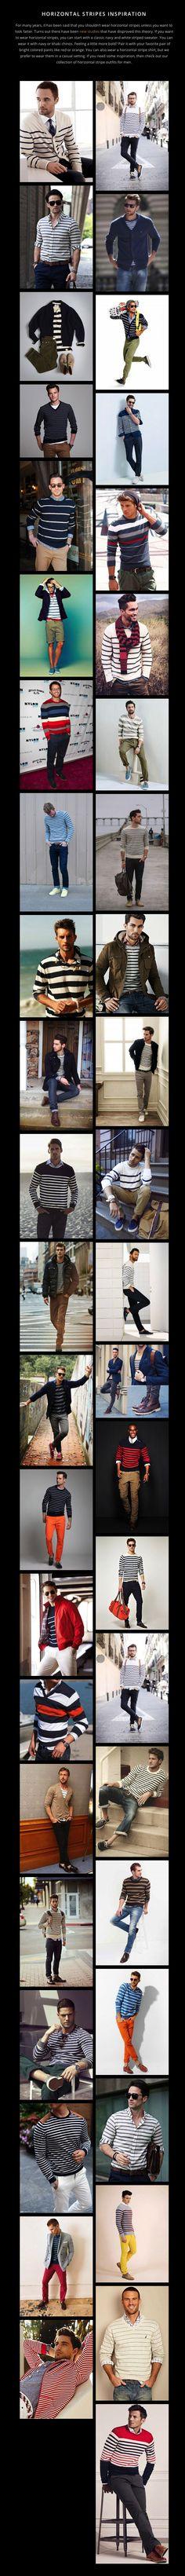 Horizontal Stripes Inspiration for Men